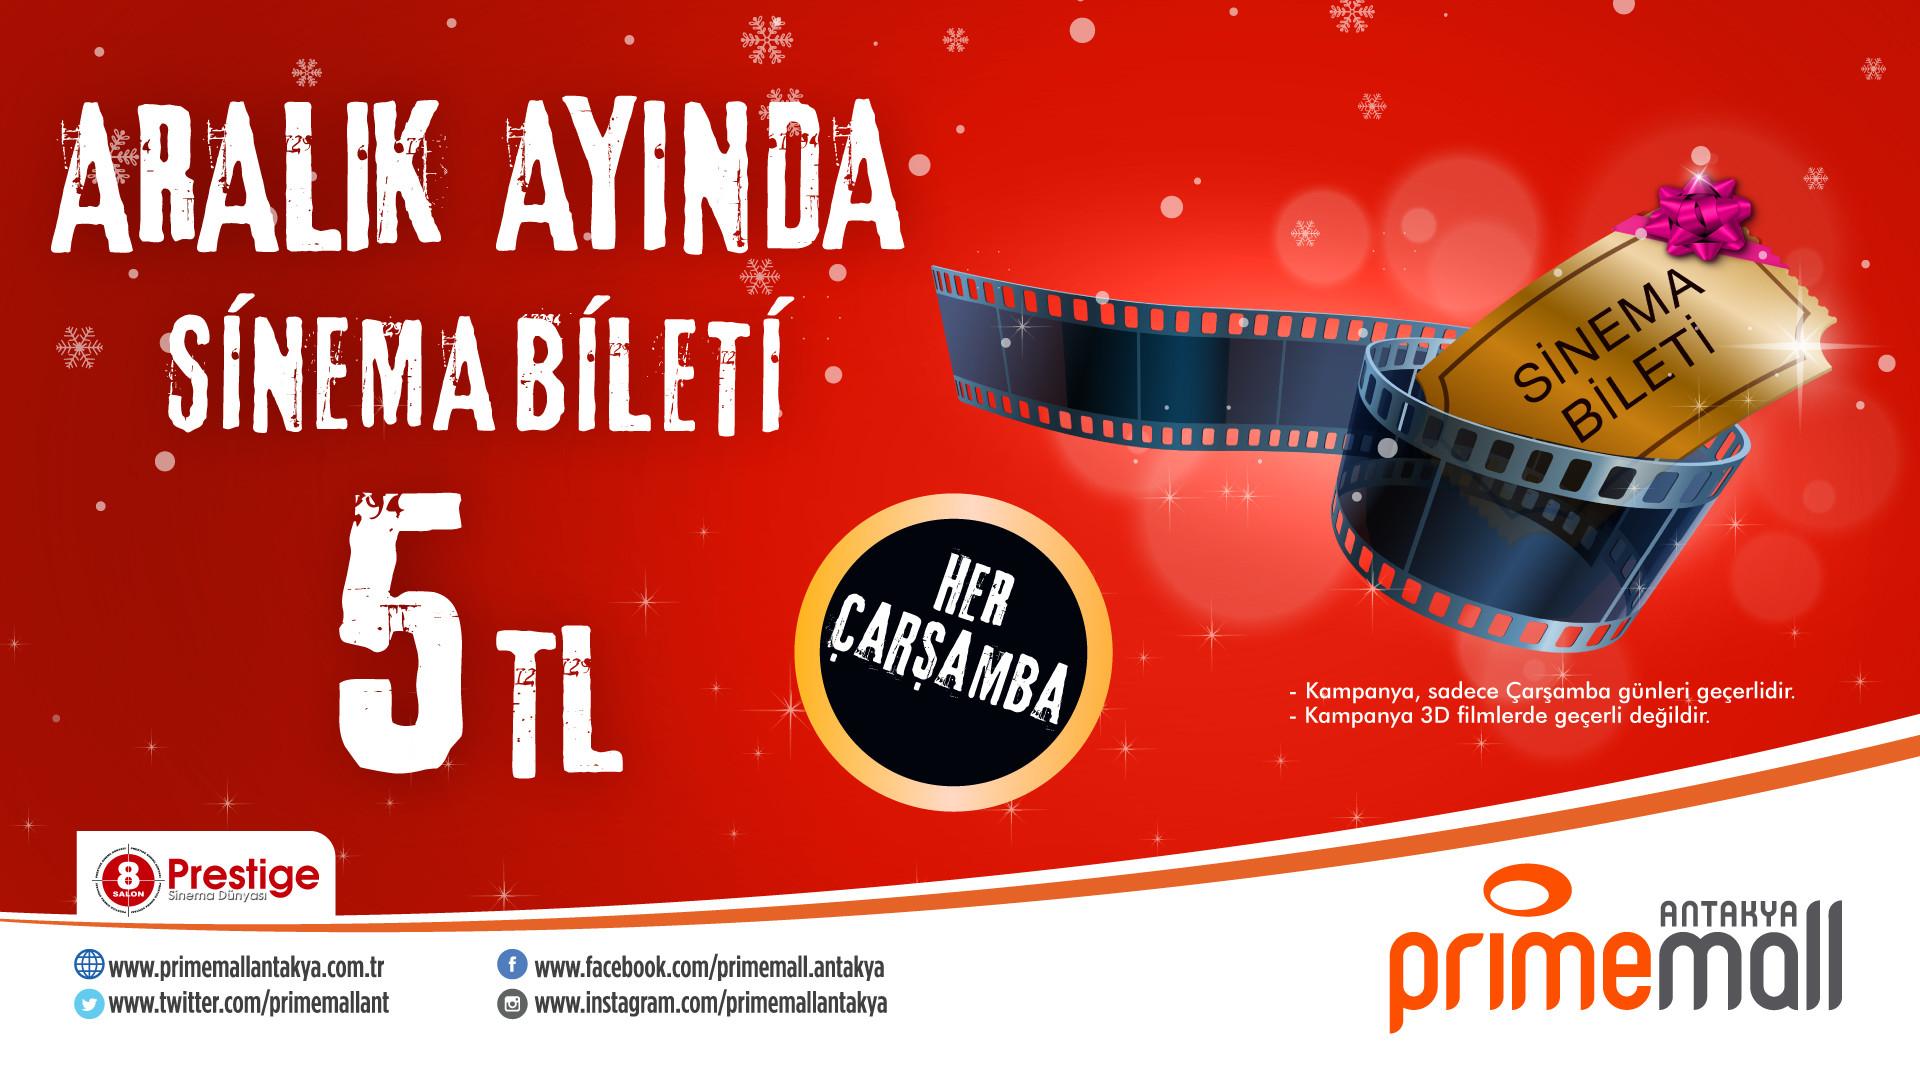 Sinema Bileti 5 TL